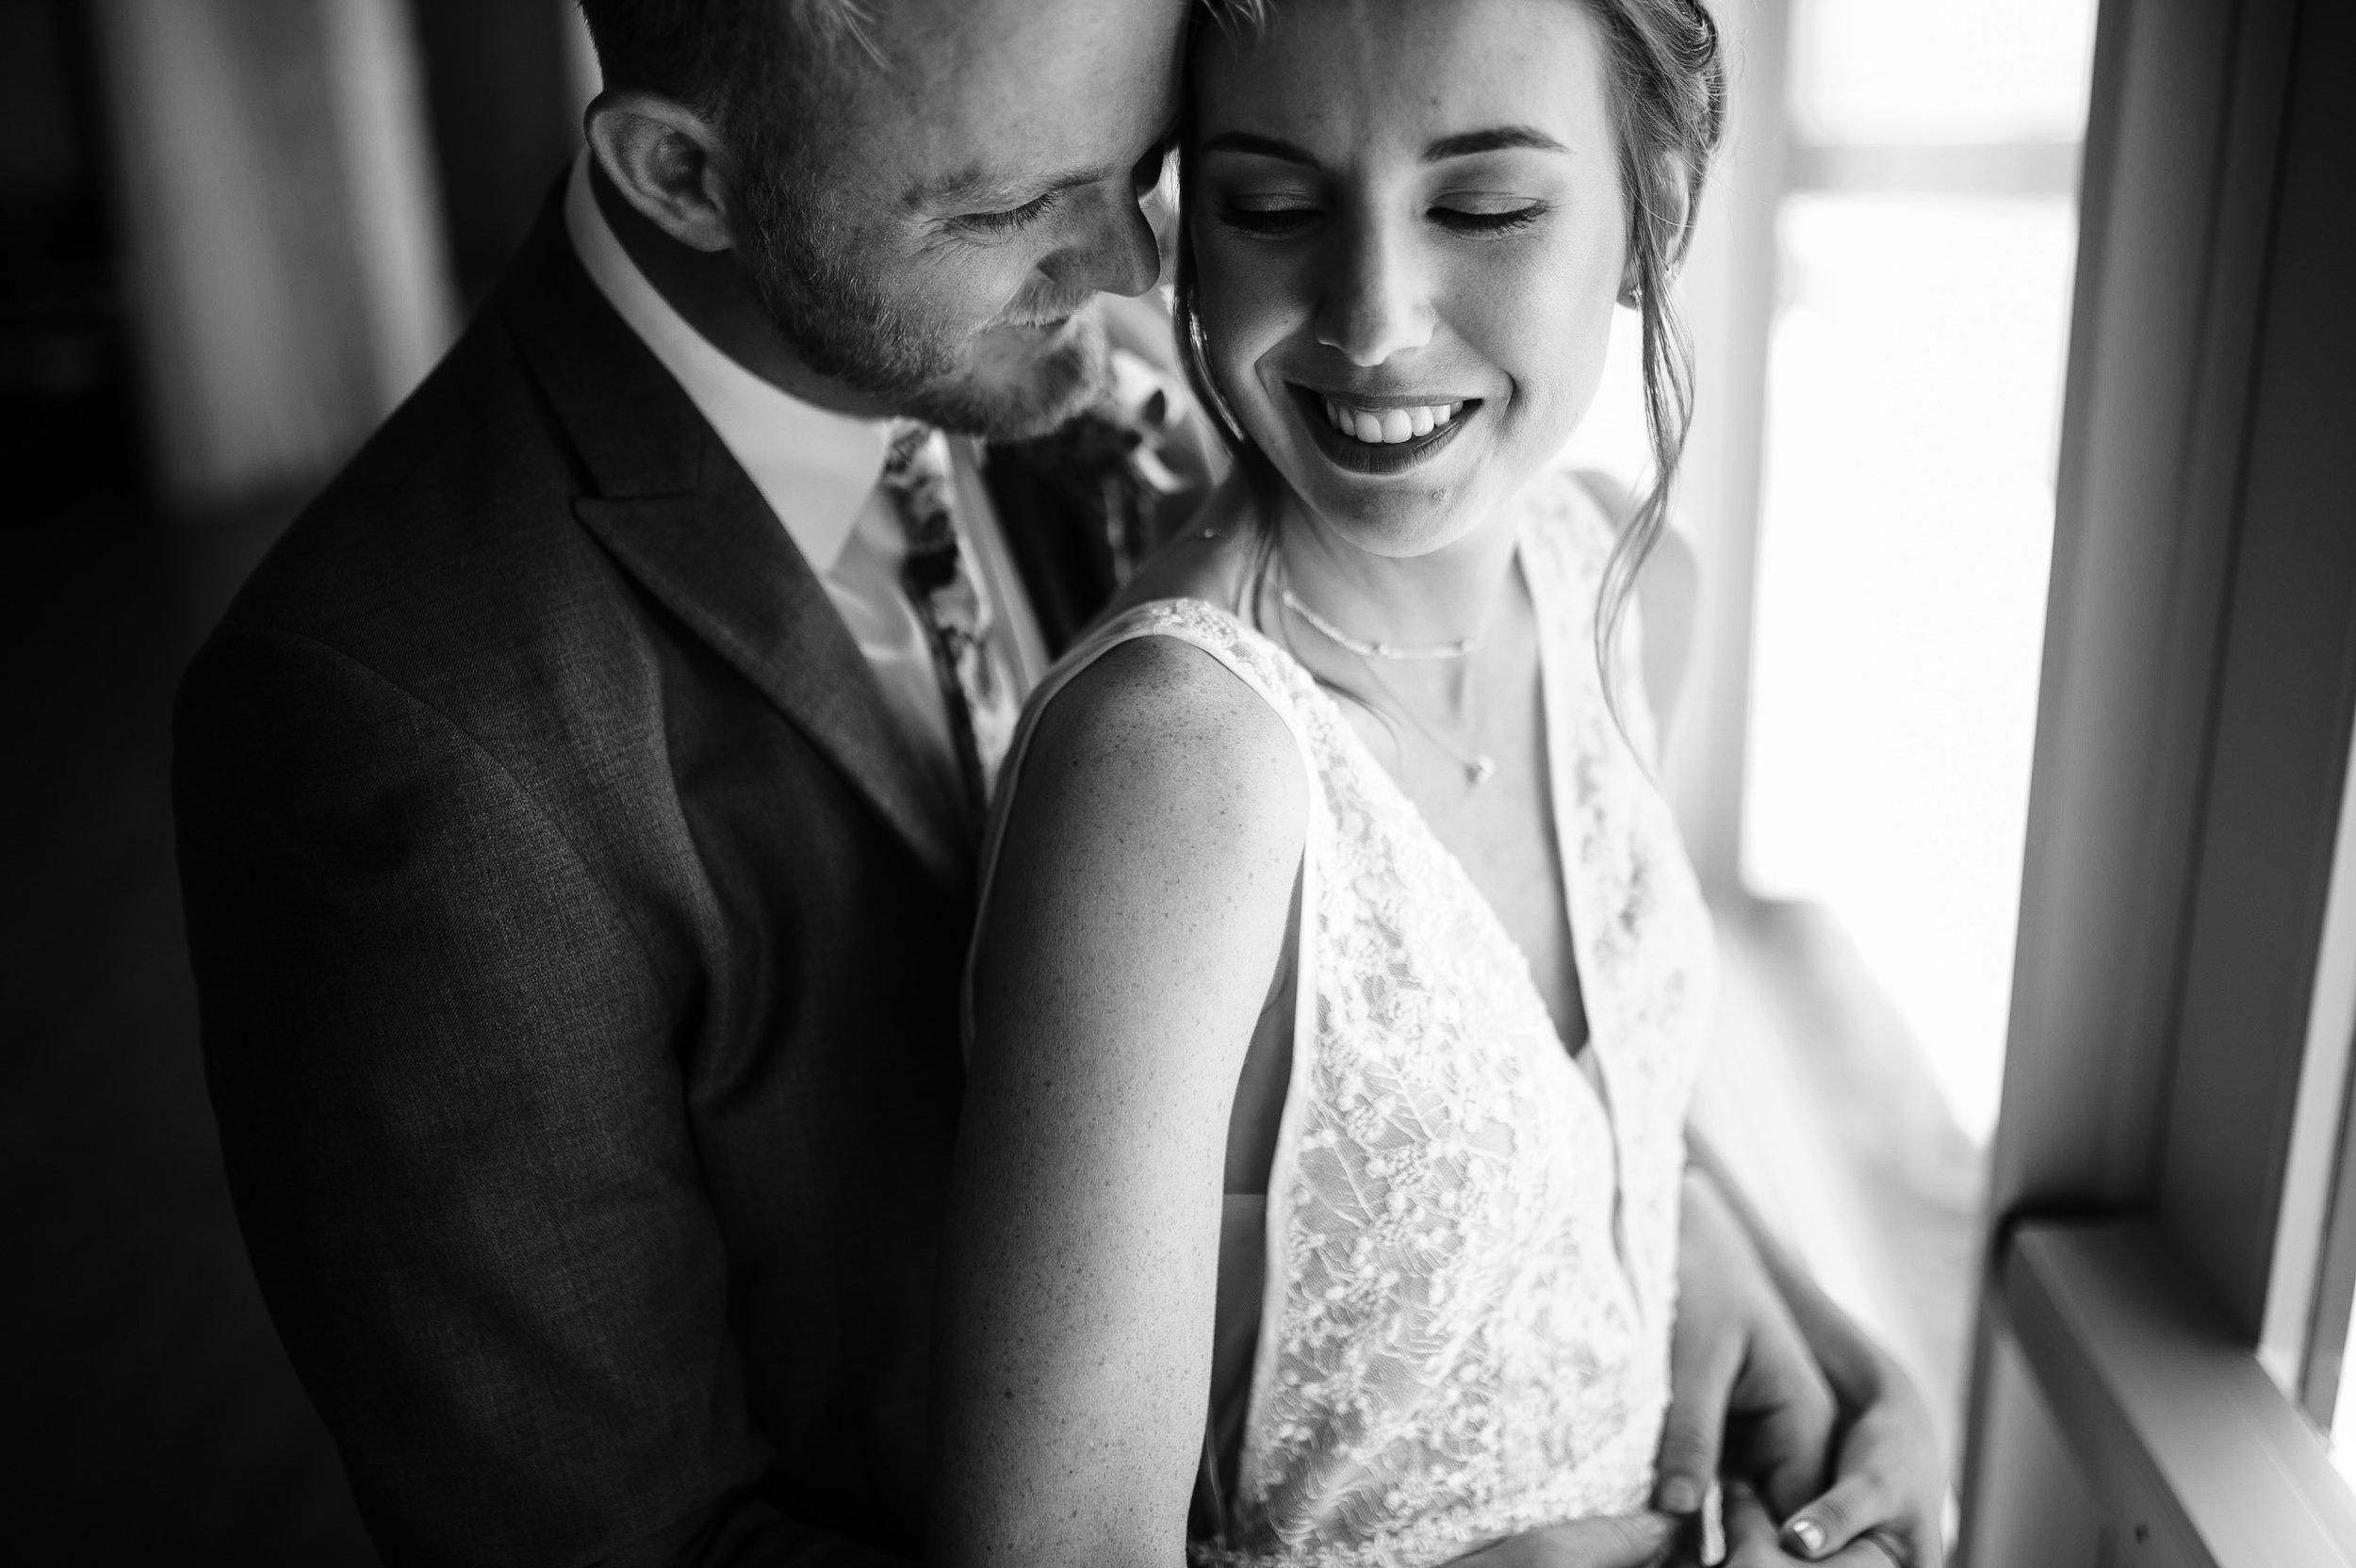 okc-wedding-photographer-coles-garden-wedding-okc-best-wedding-photographers-90.jpg